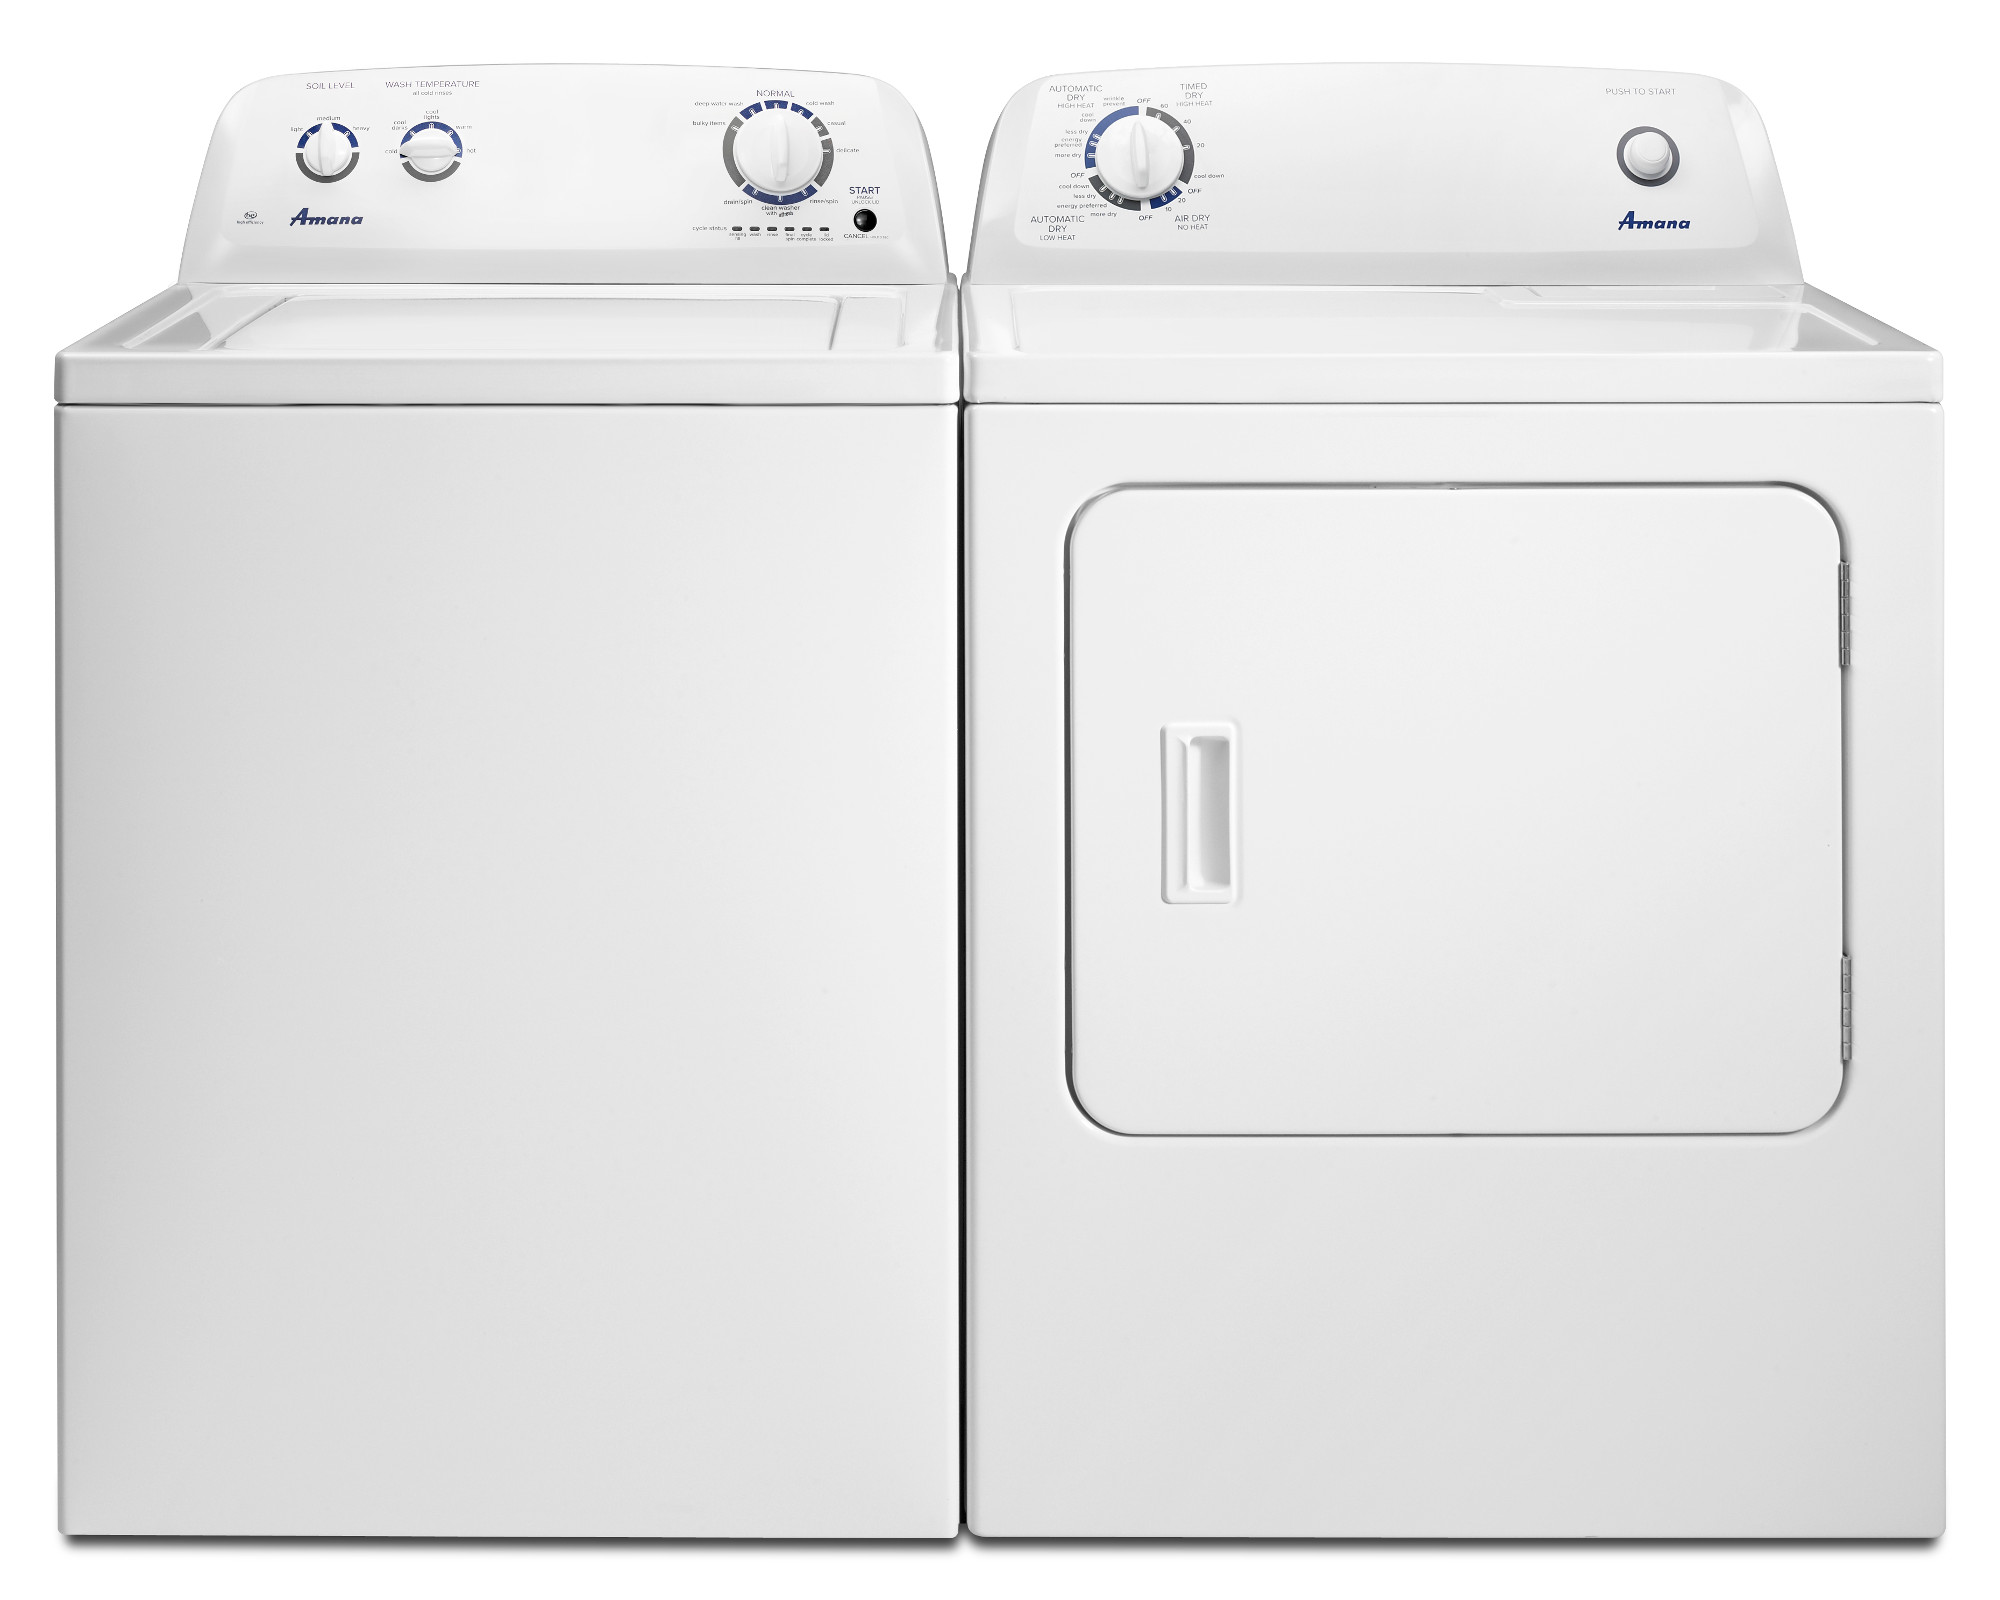 Amana 7.0 cu. ft. Gas Dryer - White